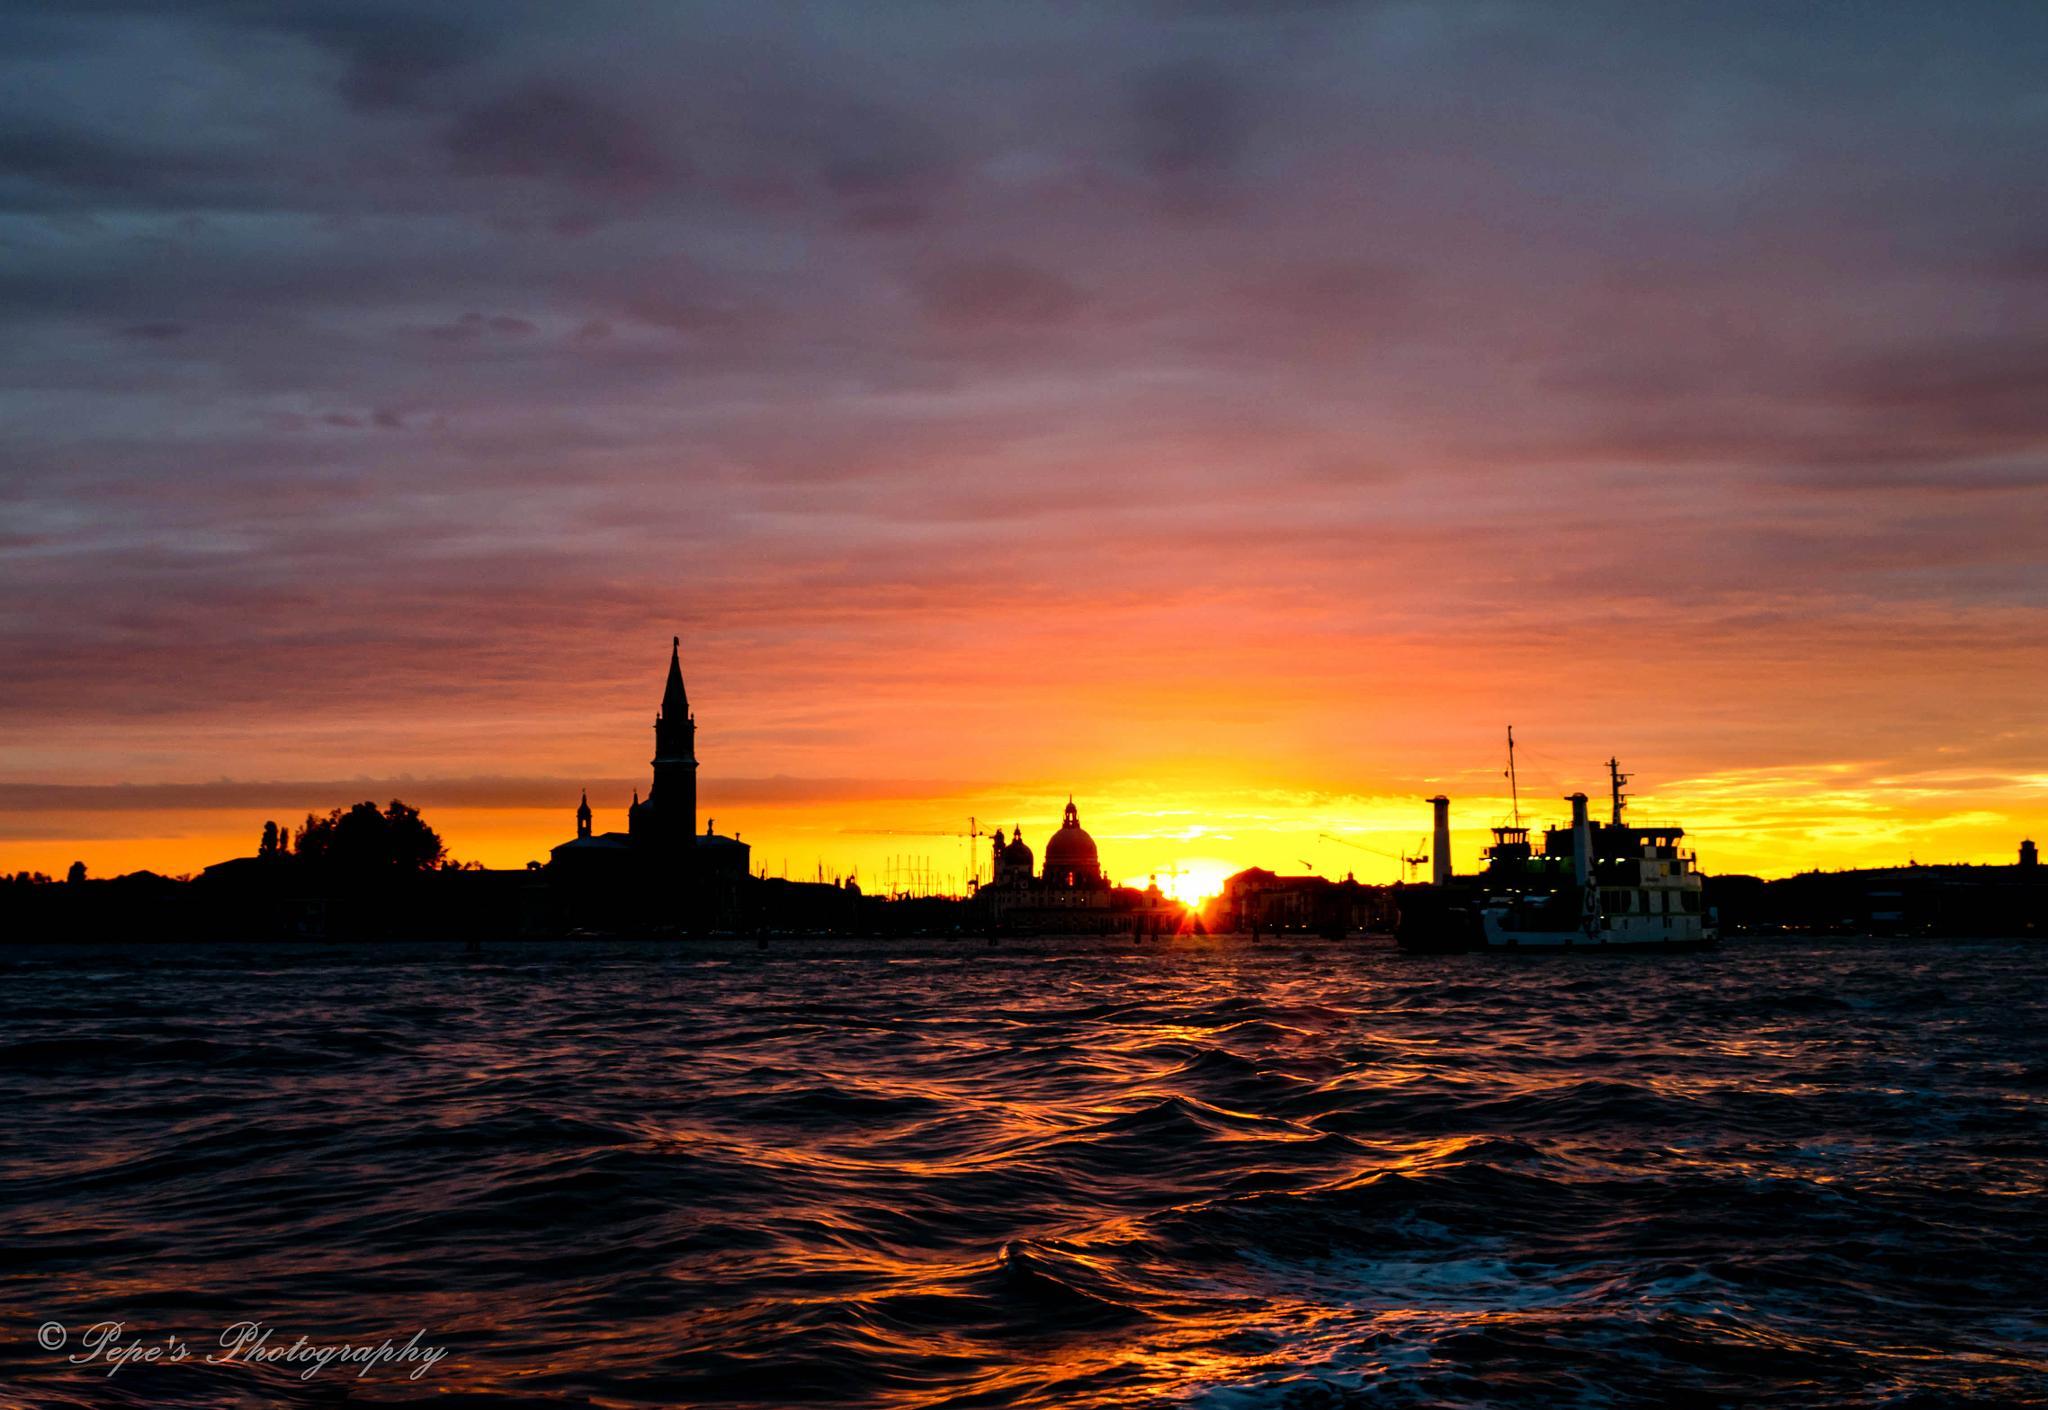 Venice's sunset by PepeRojas